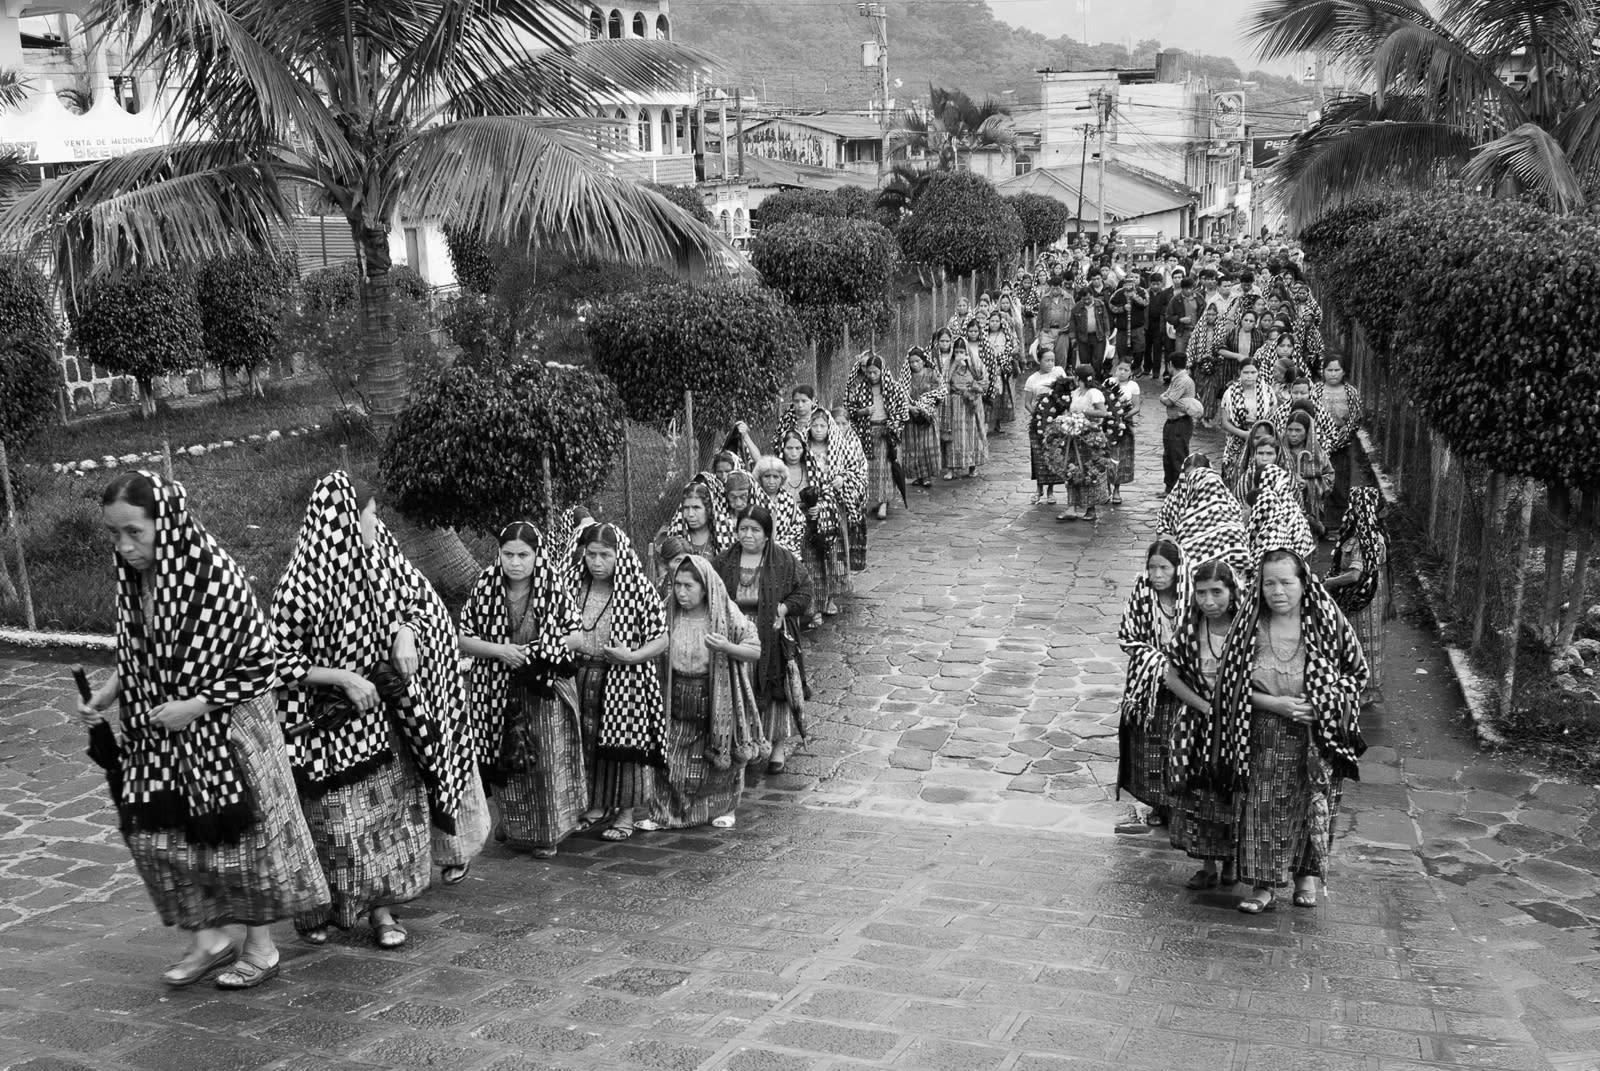 <p>Funeral procession, San Pedro, Guatemala. (Photograph by Fran Antmann) </p>